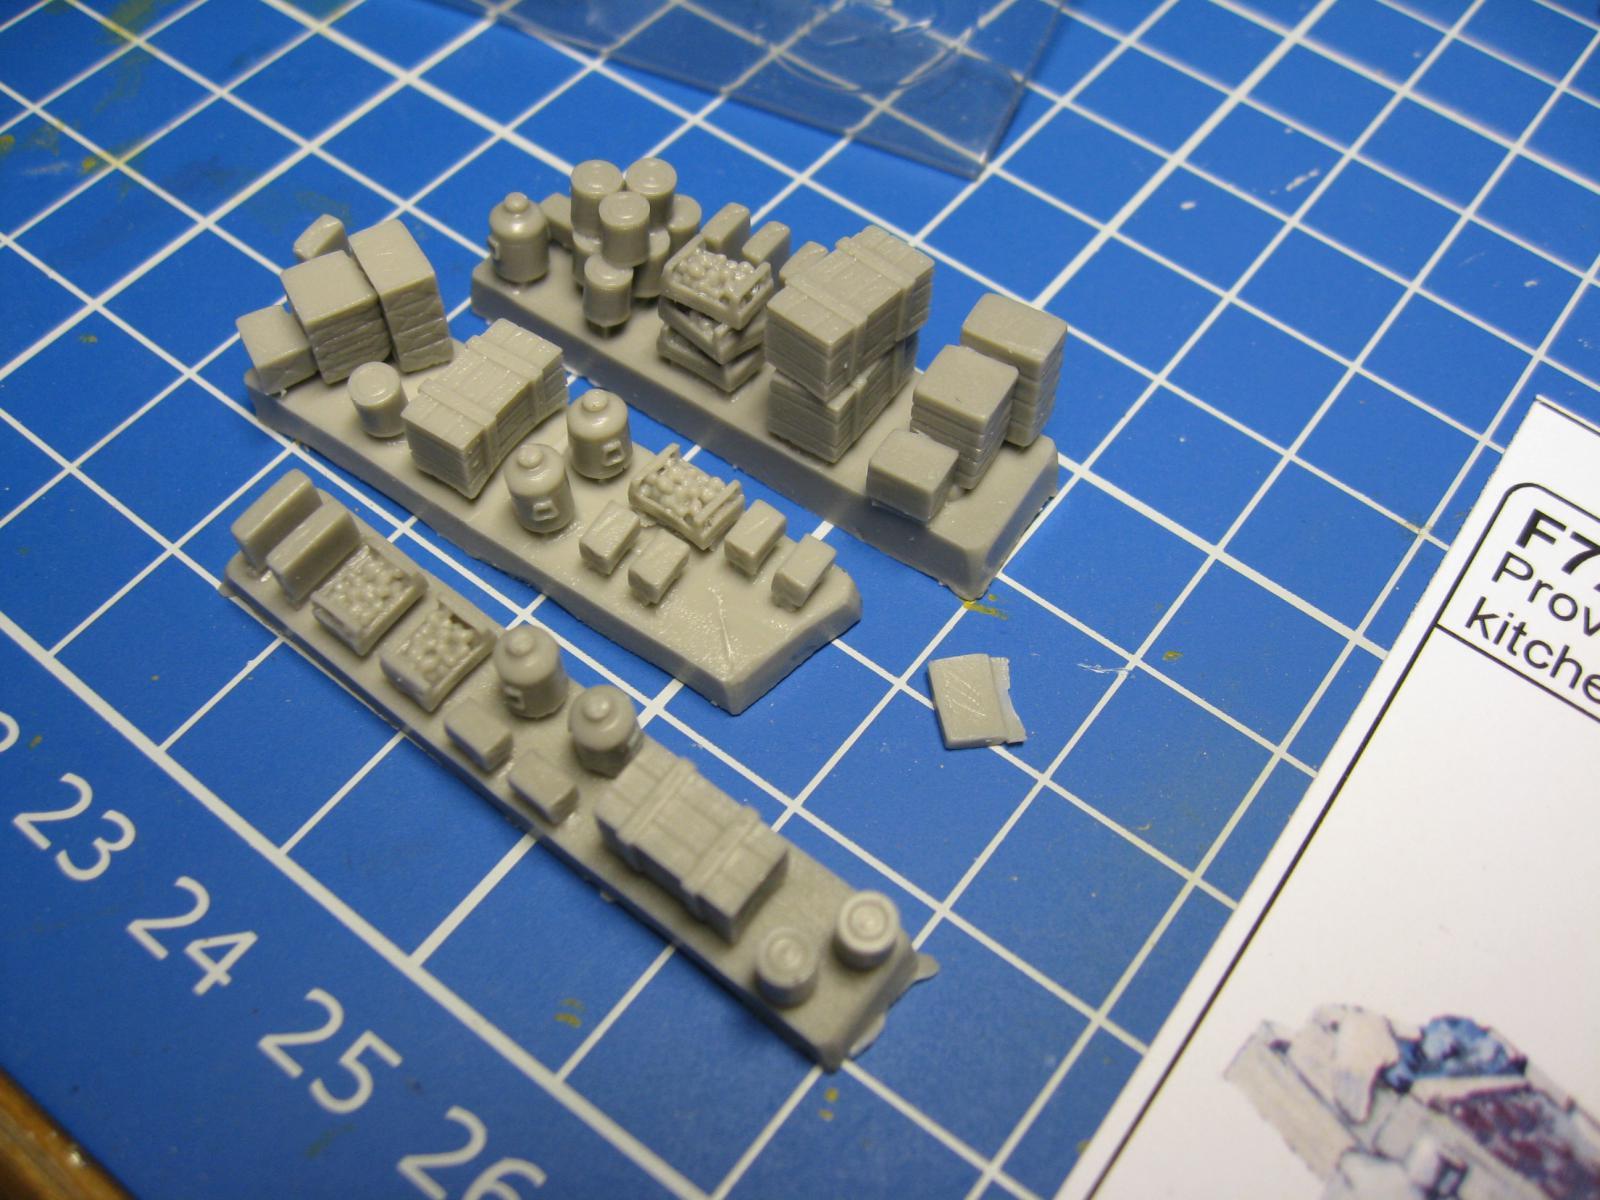 CMK - Proviant Set for Field Kitchen / 1:72 Kn1y-bo-a96b